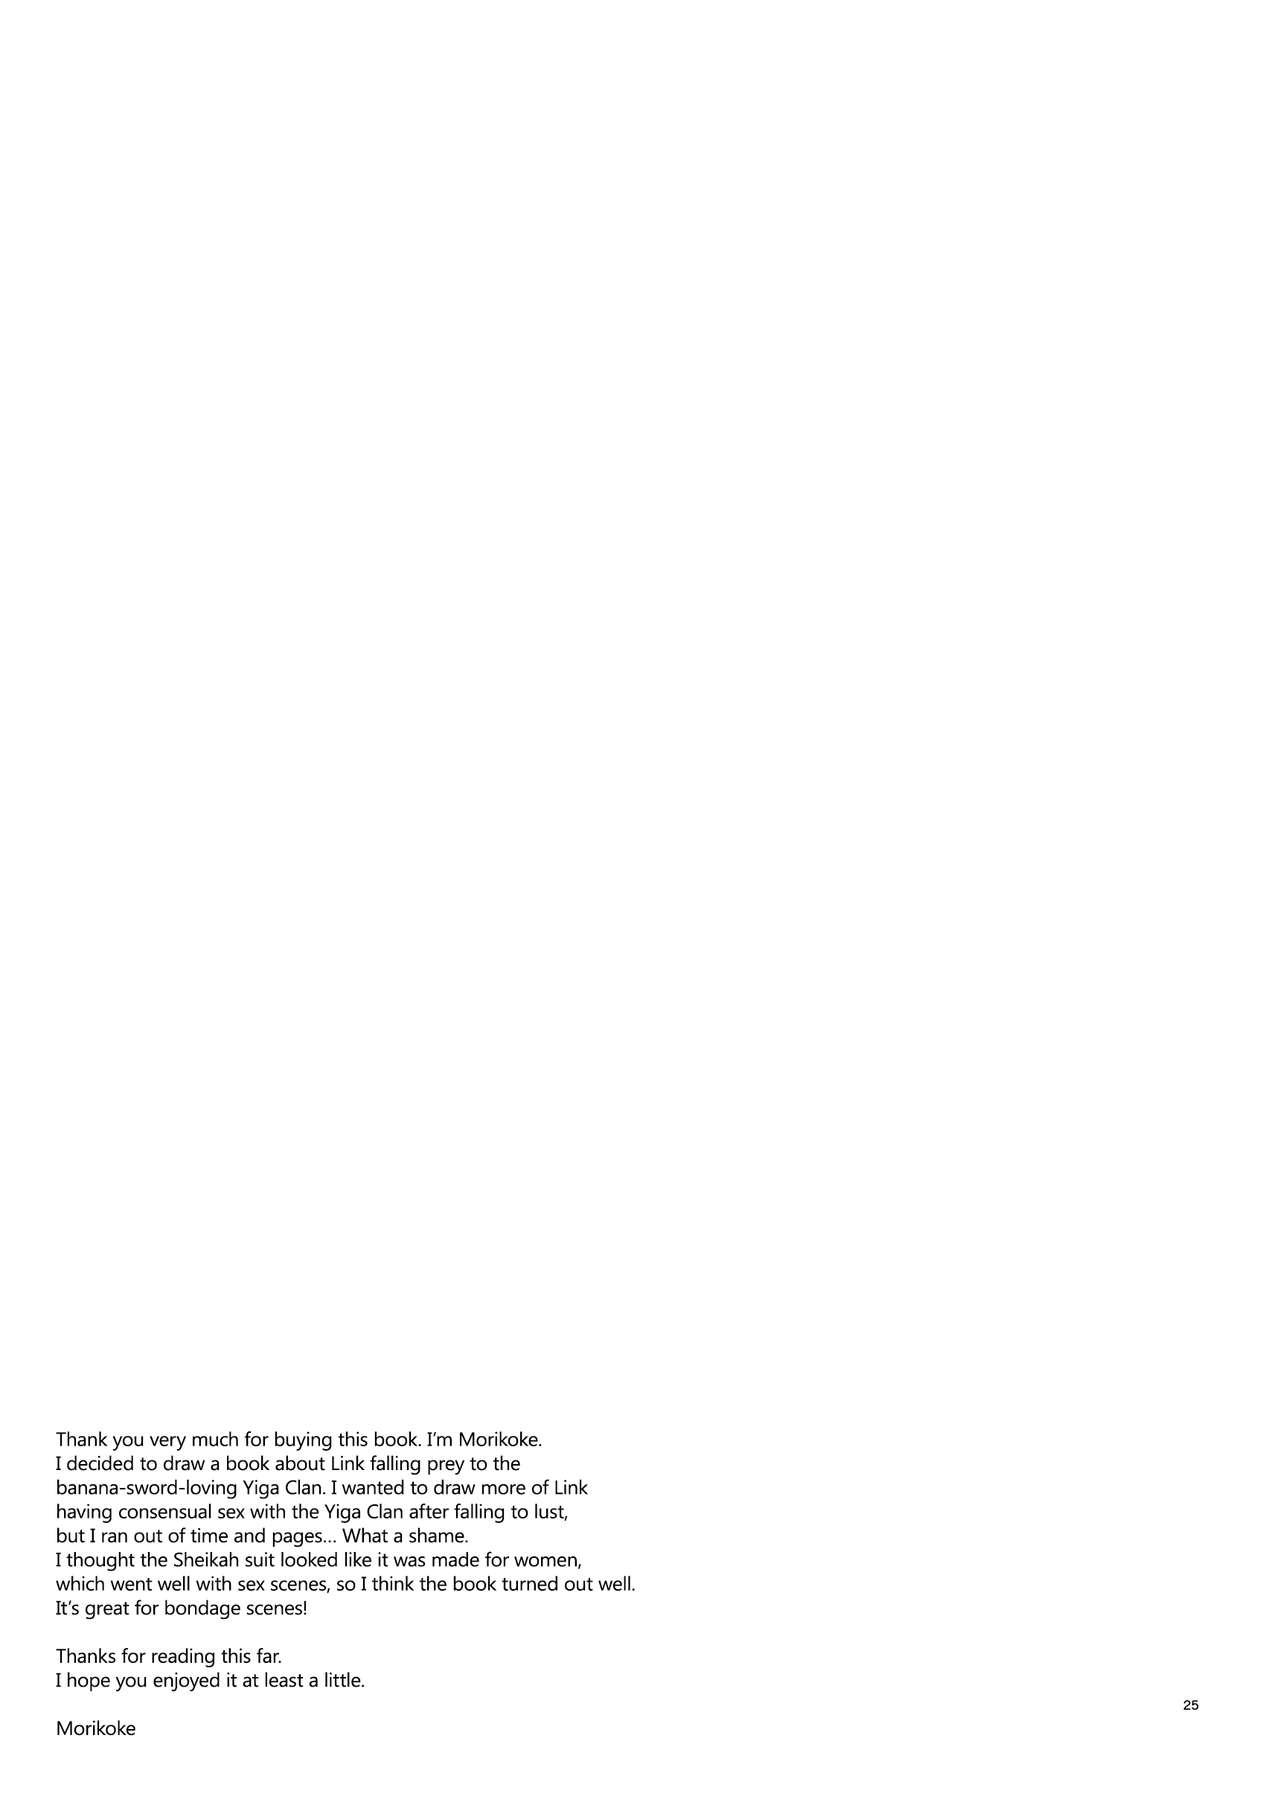 [Morittokoke (Morikoke)] Eiketsu Ninja Gaiden ~Haiboku Hen~ | The Champion's Ninja Side Story ~Failure~ (The Legend of Zelda) [English] =TLL + mrwayne= [Digital] 22